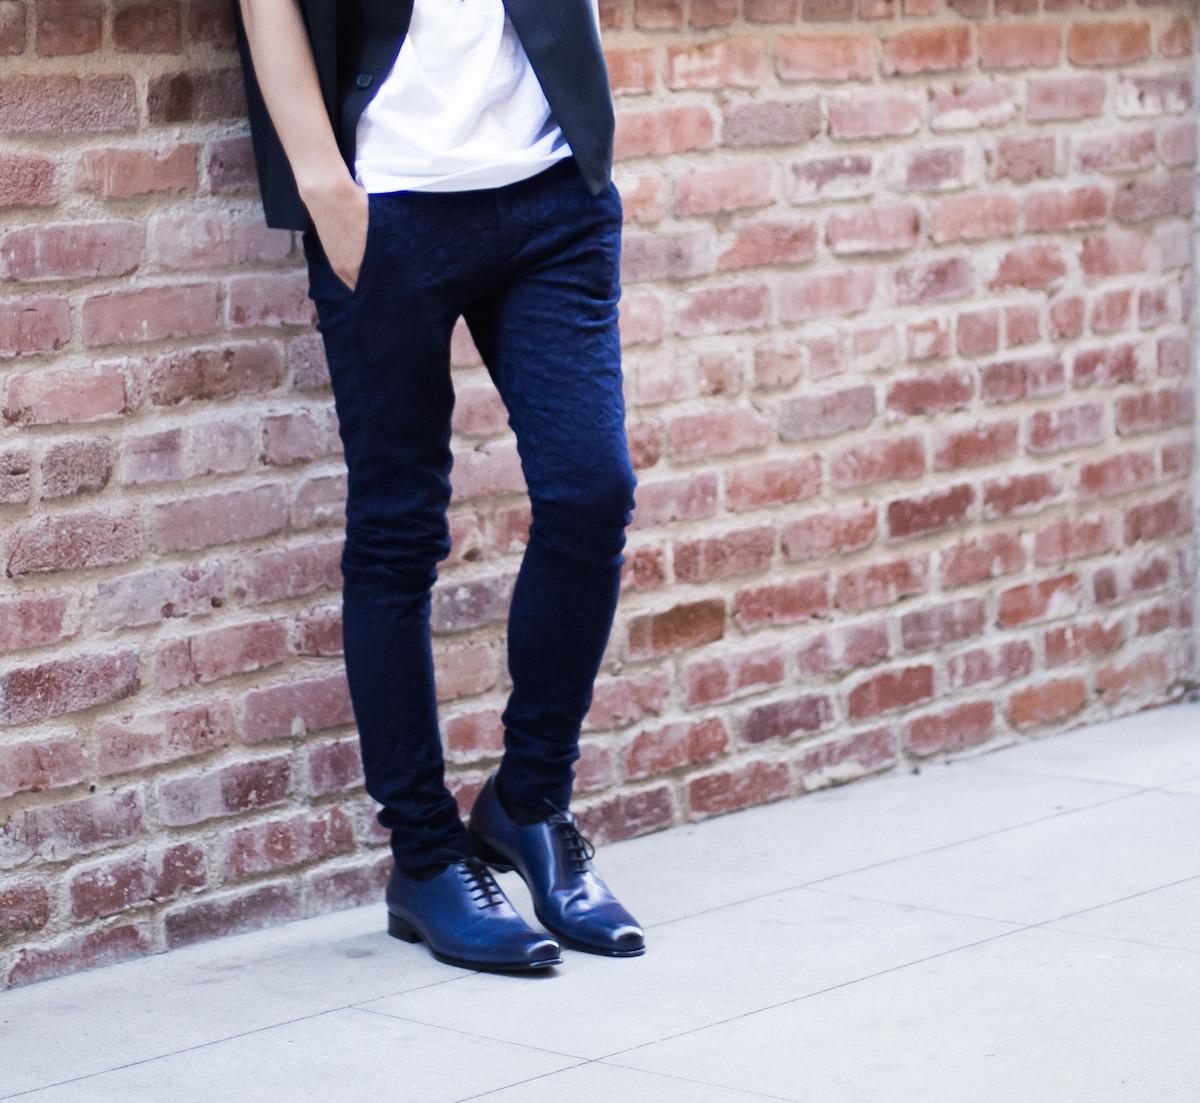 cos-sleeveless-blazer-unisex-menswear-mybelonging-tommylei-8.jpg